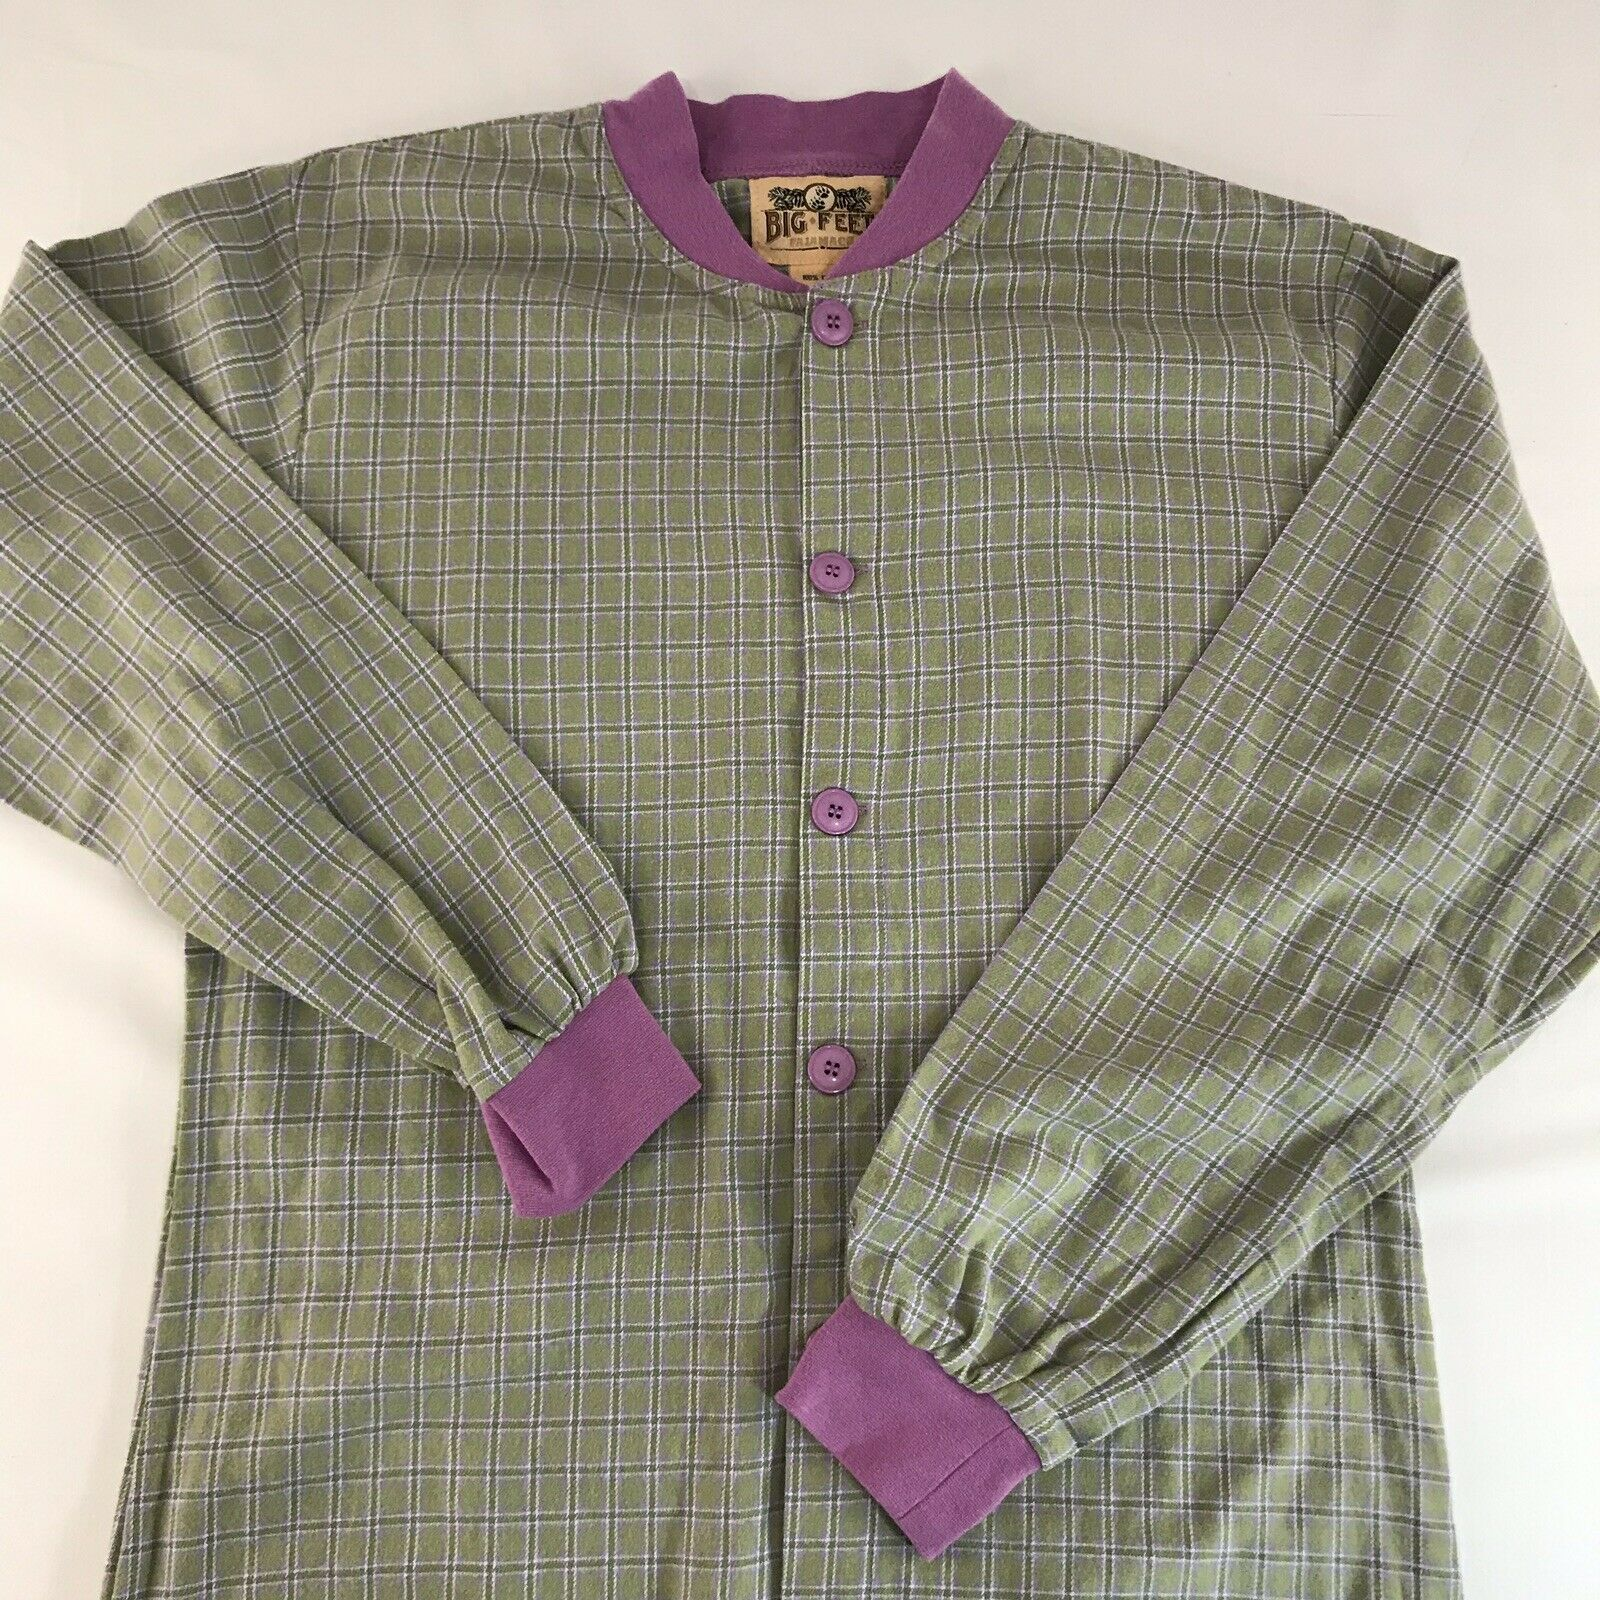 Big Feet Pajama Co Adult Small Footed PJs Plaid Green Purple Footie